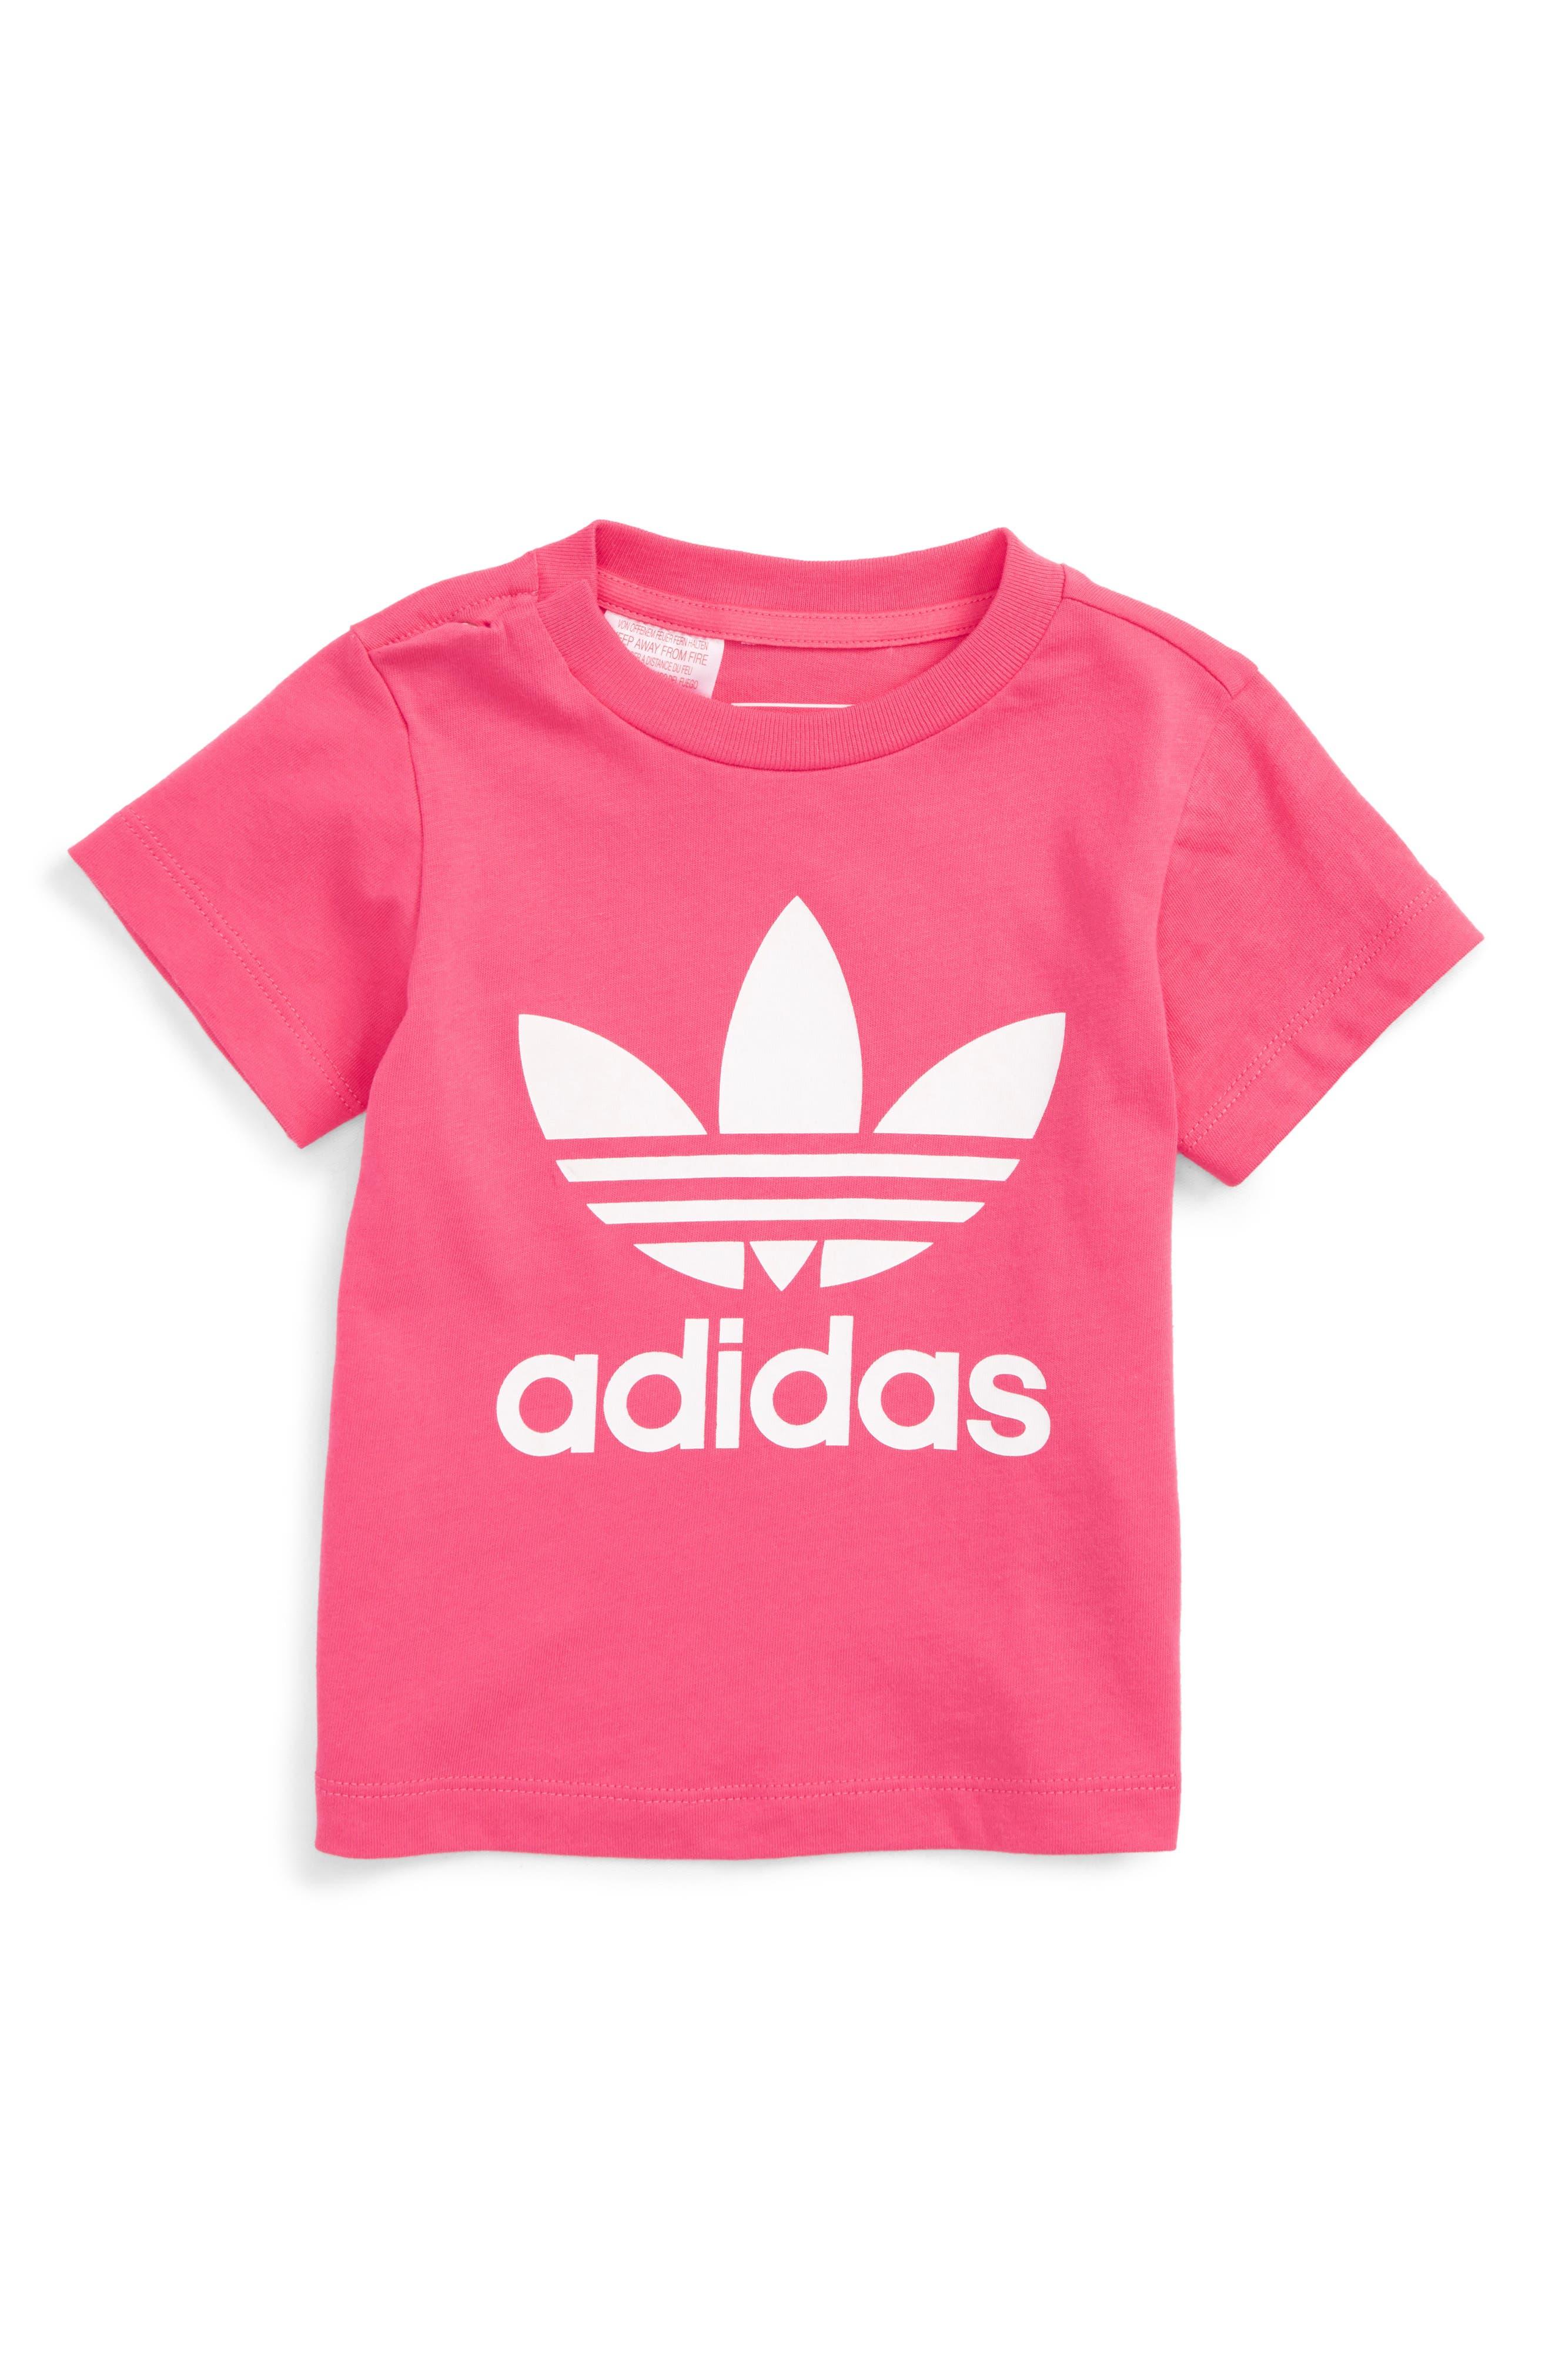 Originals Trefoil Logo Tee,                         Main,                         color, Real Pink / White